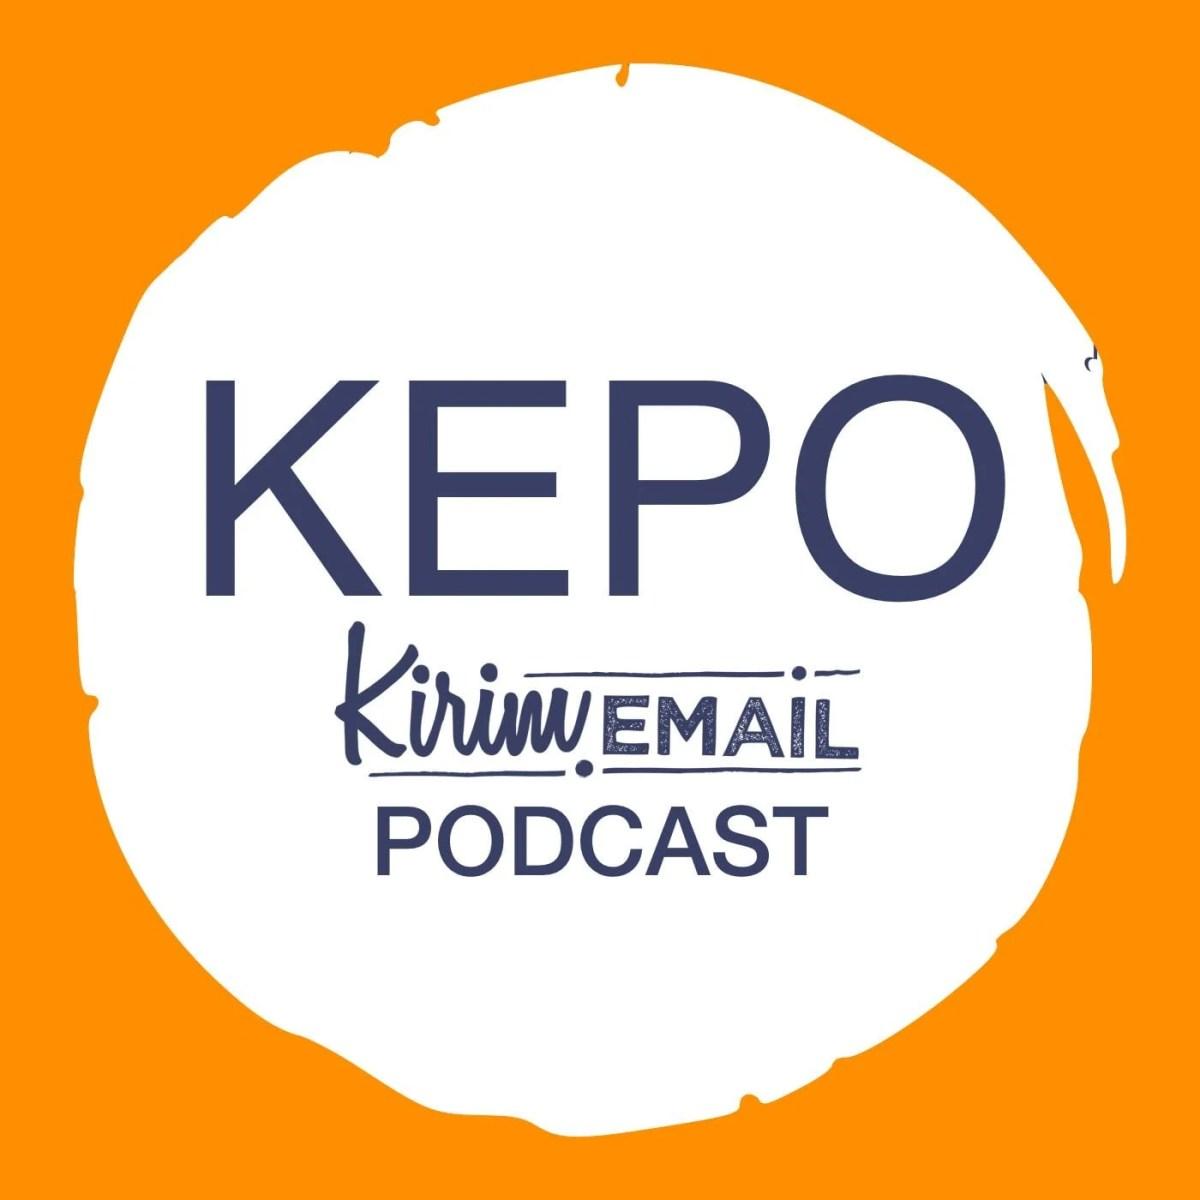 podcast terbaik 2017 - KEPO - KIRIM EMAIL Podcast